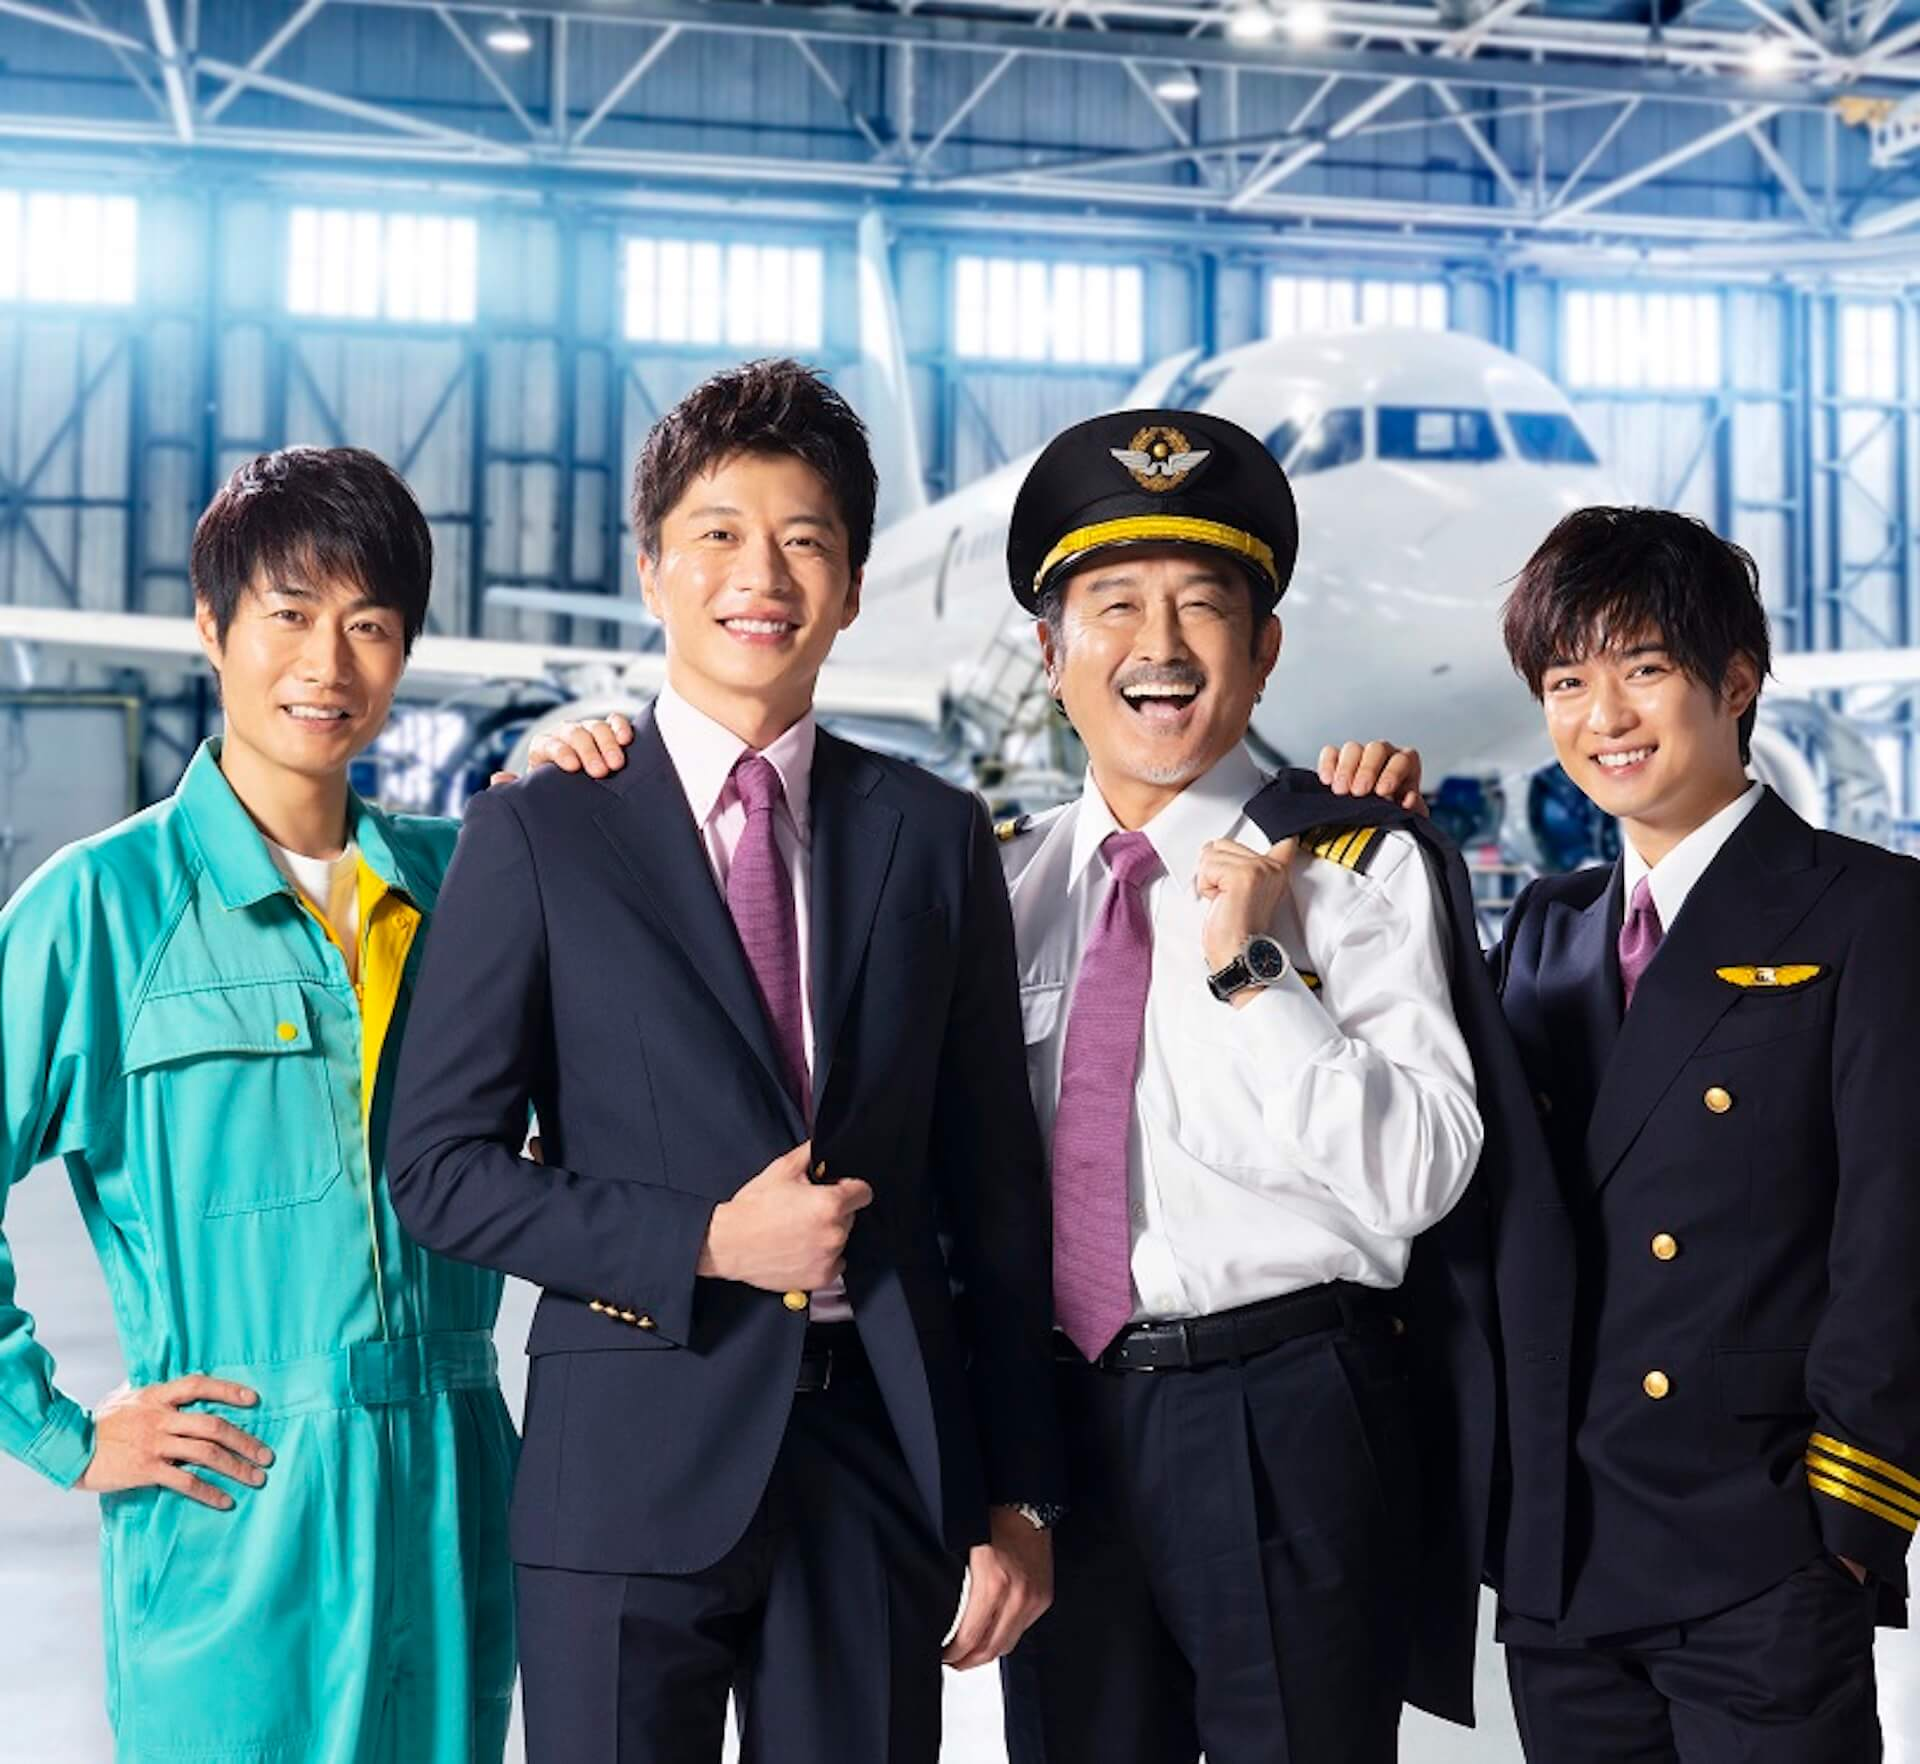 sumika新曲「願い」、『おっさんずラブ -in the sky-』の主題歌に!はるたん役田中圭からコメントも music191018_sumika_ossanslove_2